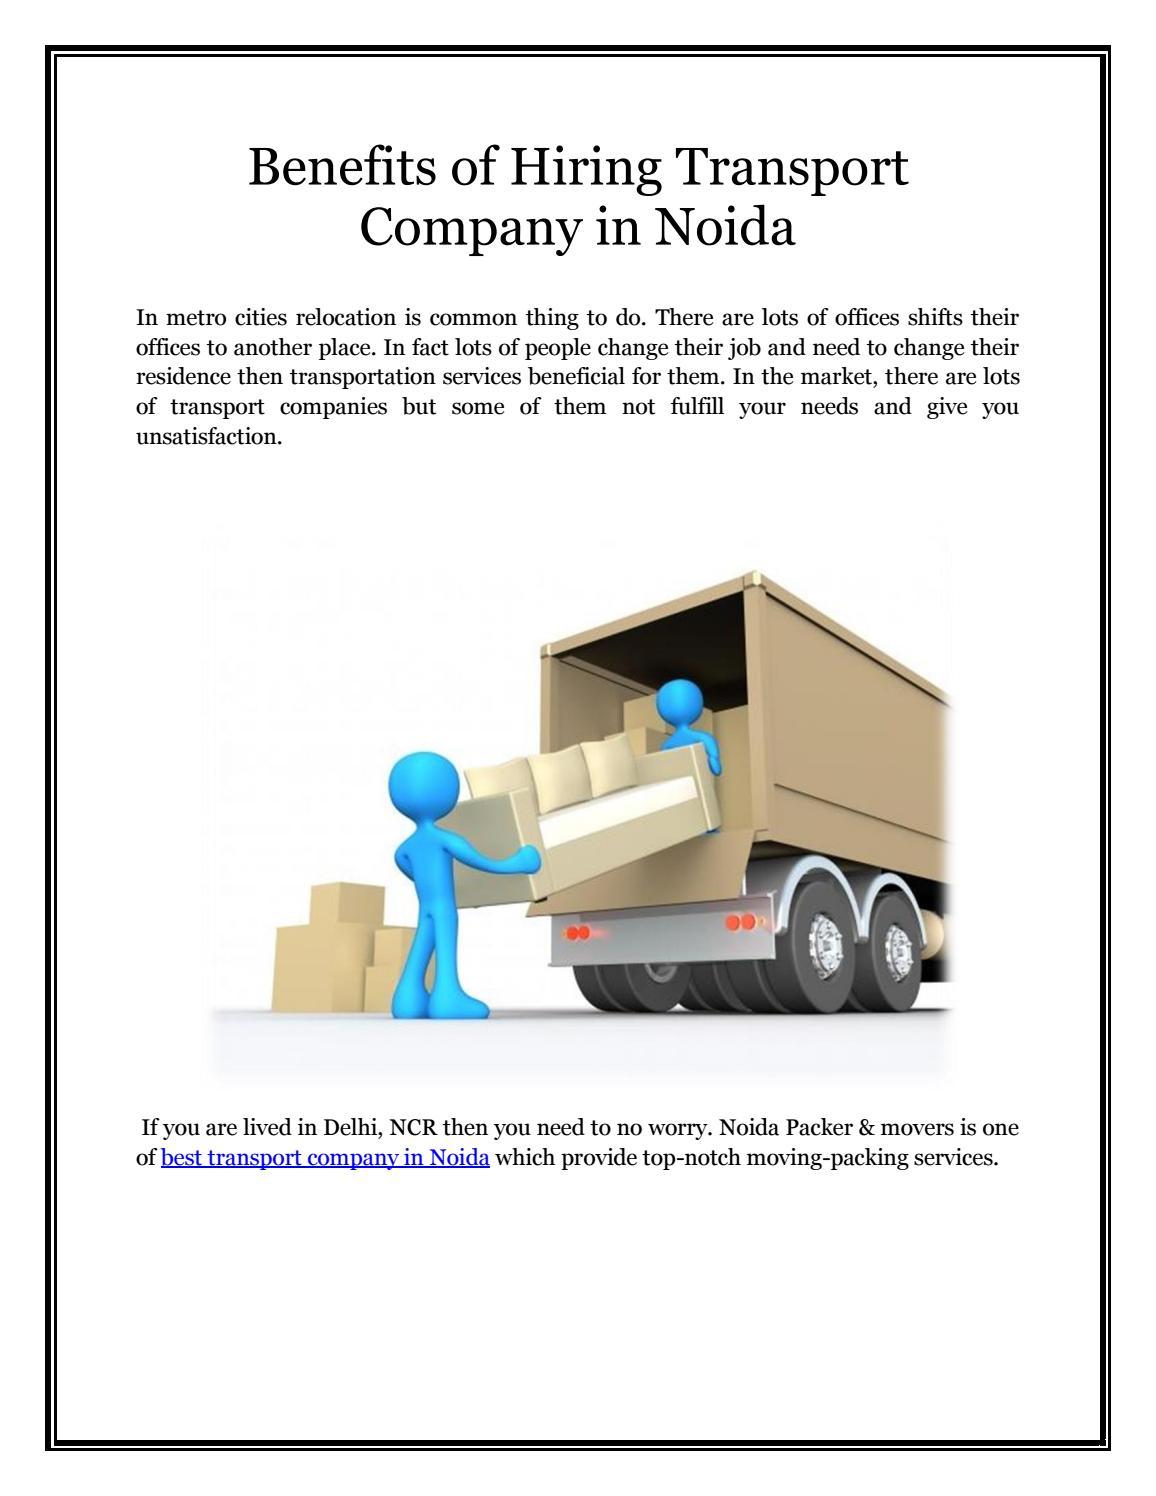 Benefits of hiring transport company in noida by noidapackermoversin